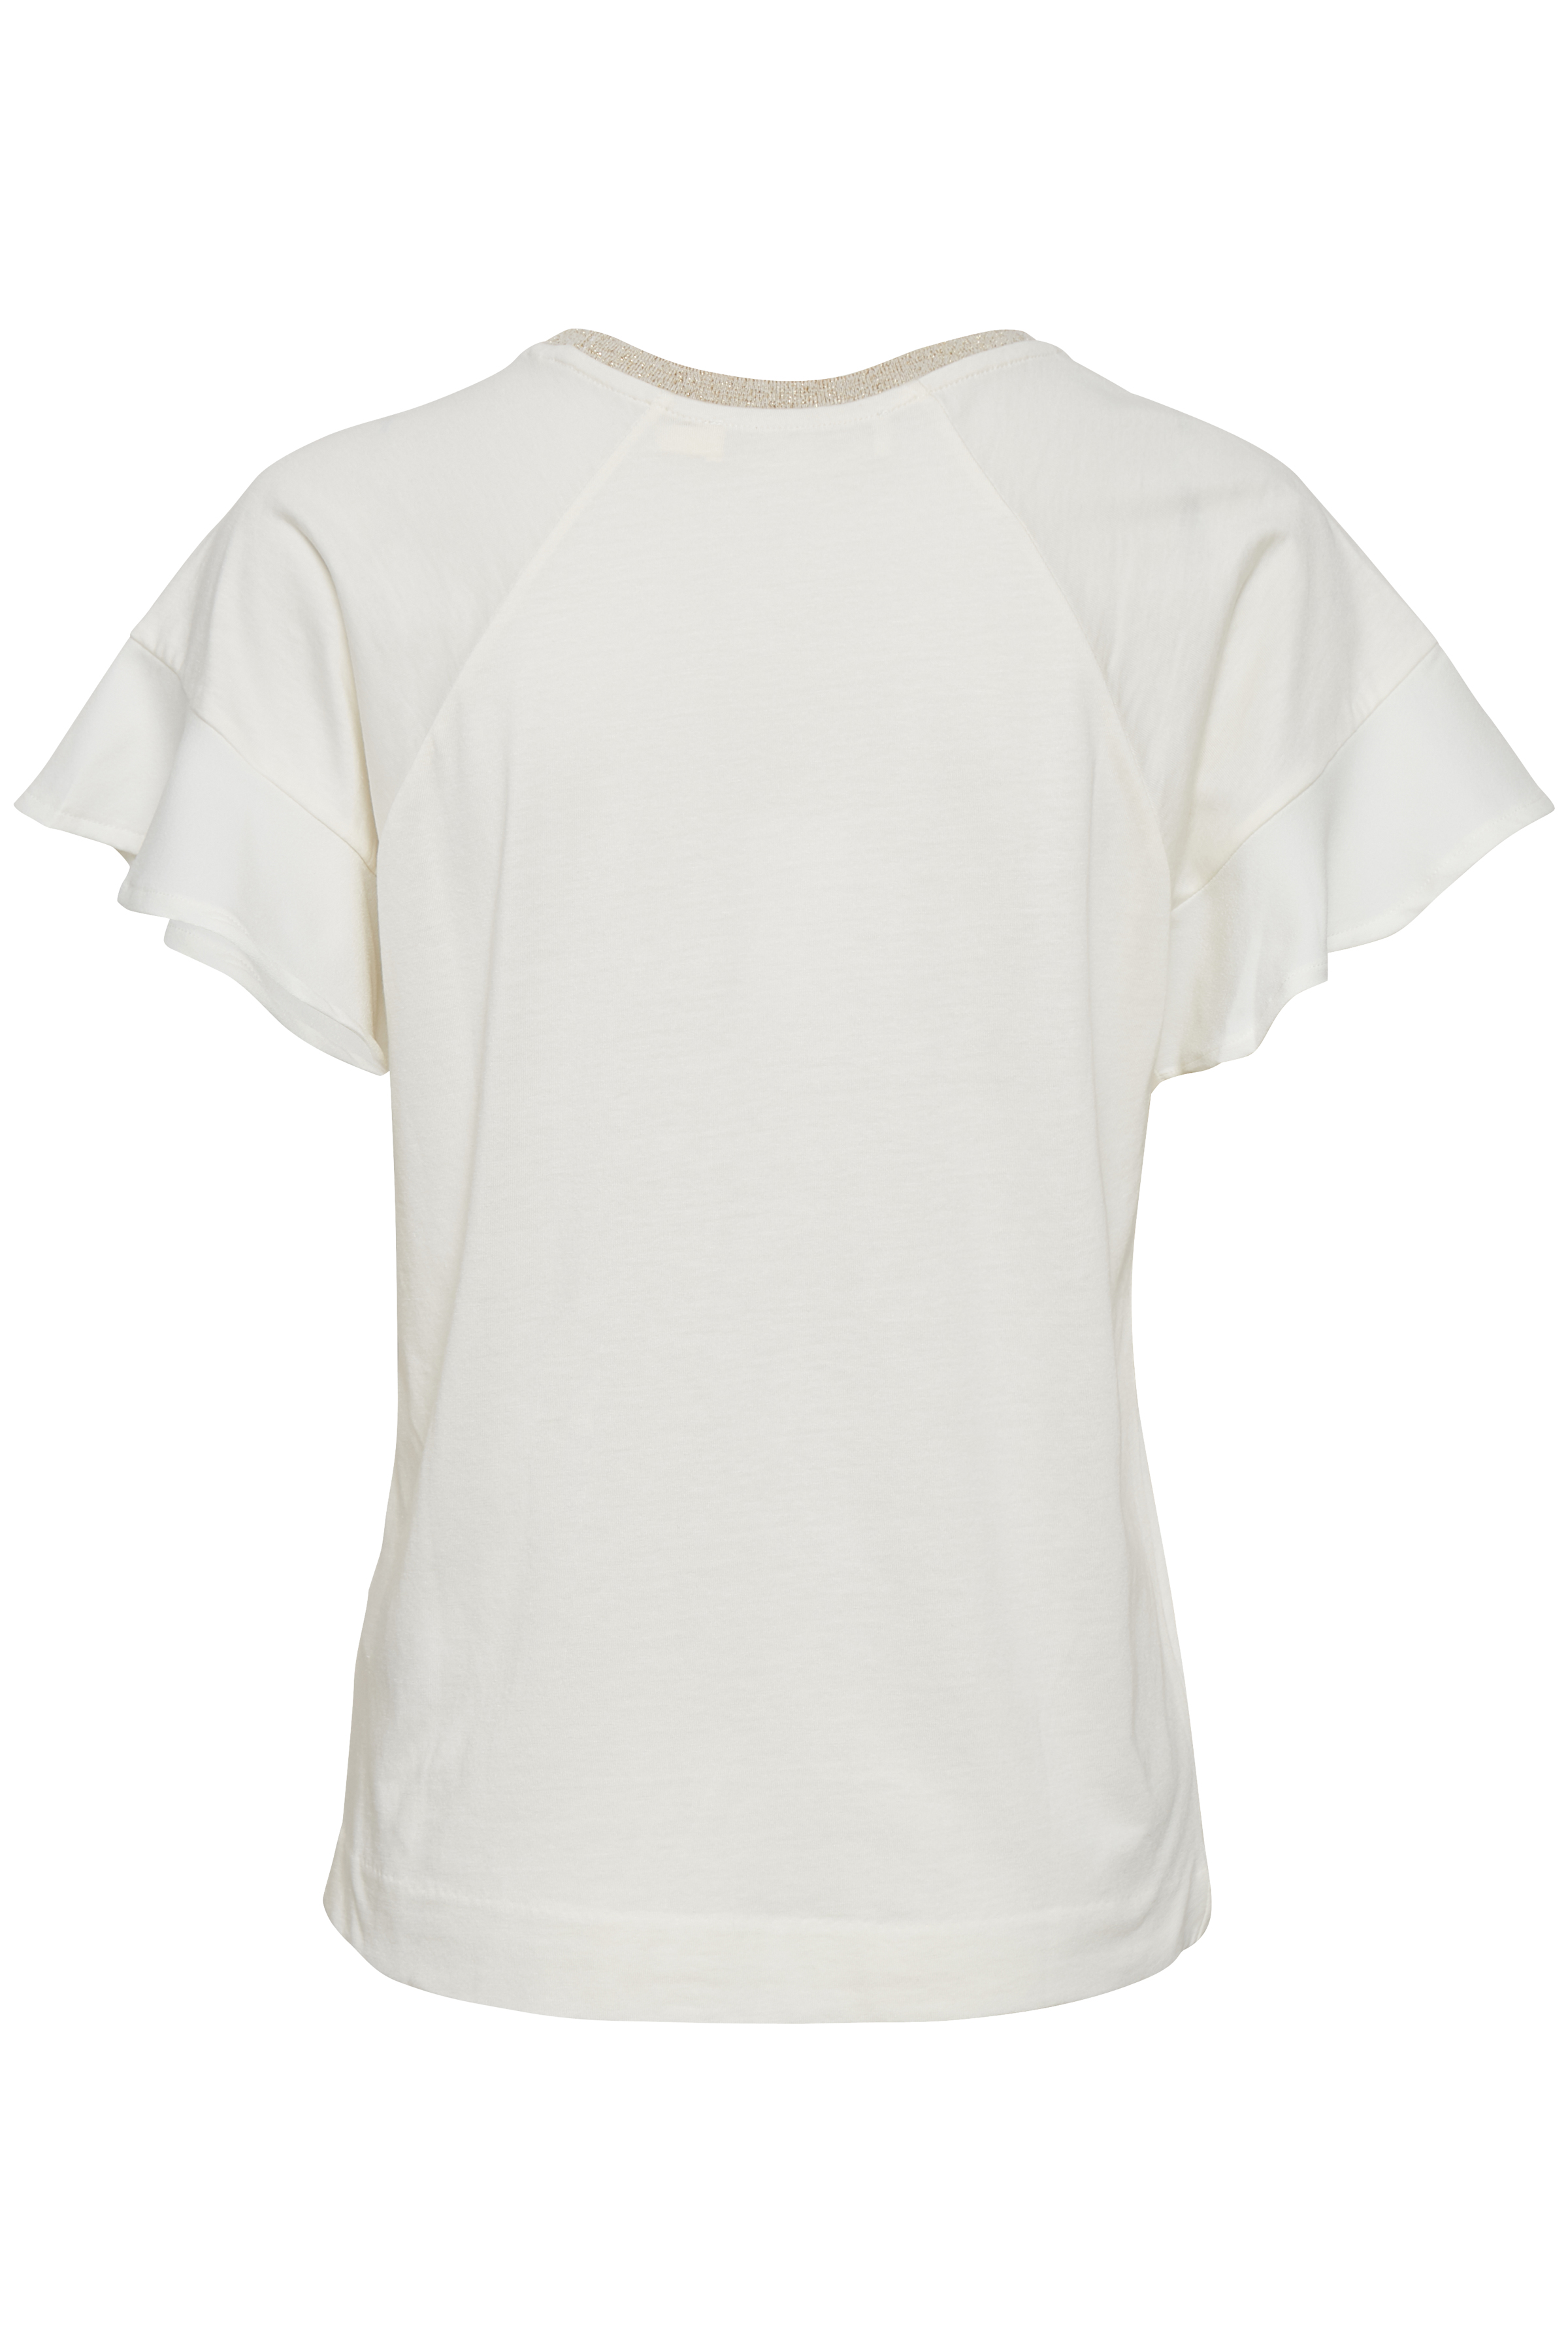 White Smoke T-Shirt – Køb White Smoke T-Shirt fra str. XS-XXL her